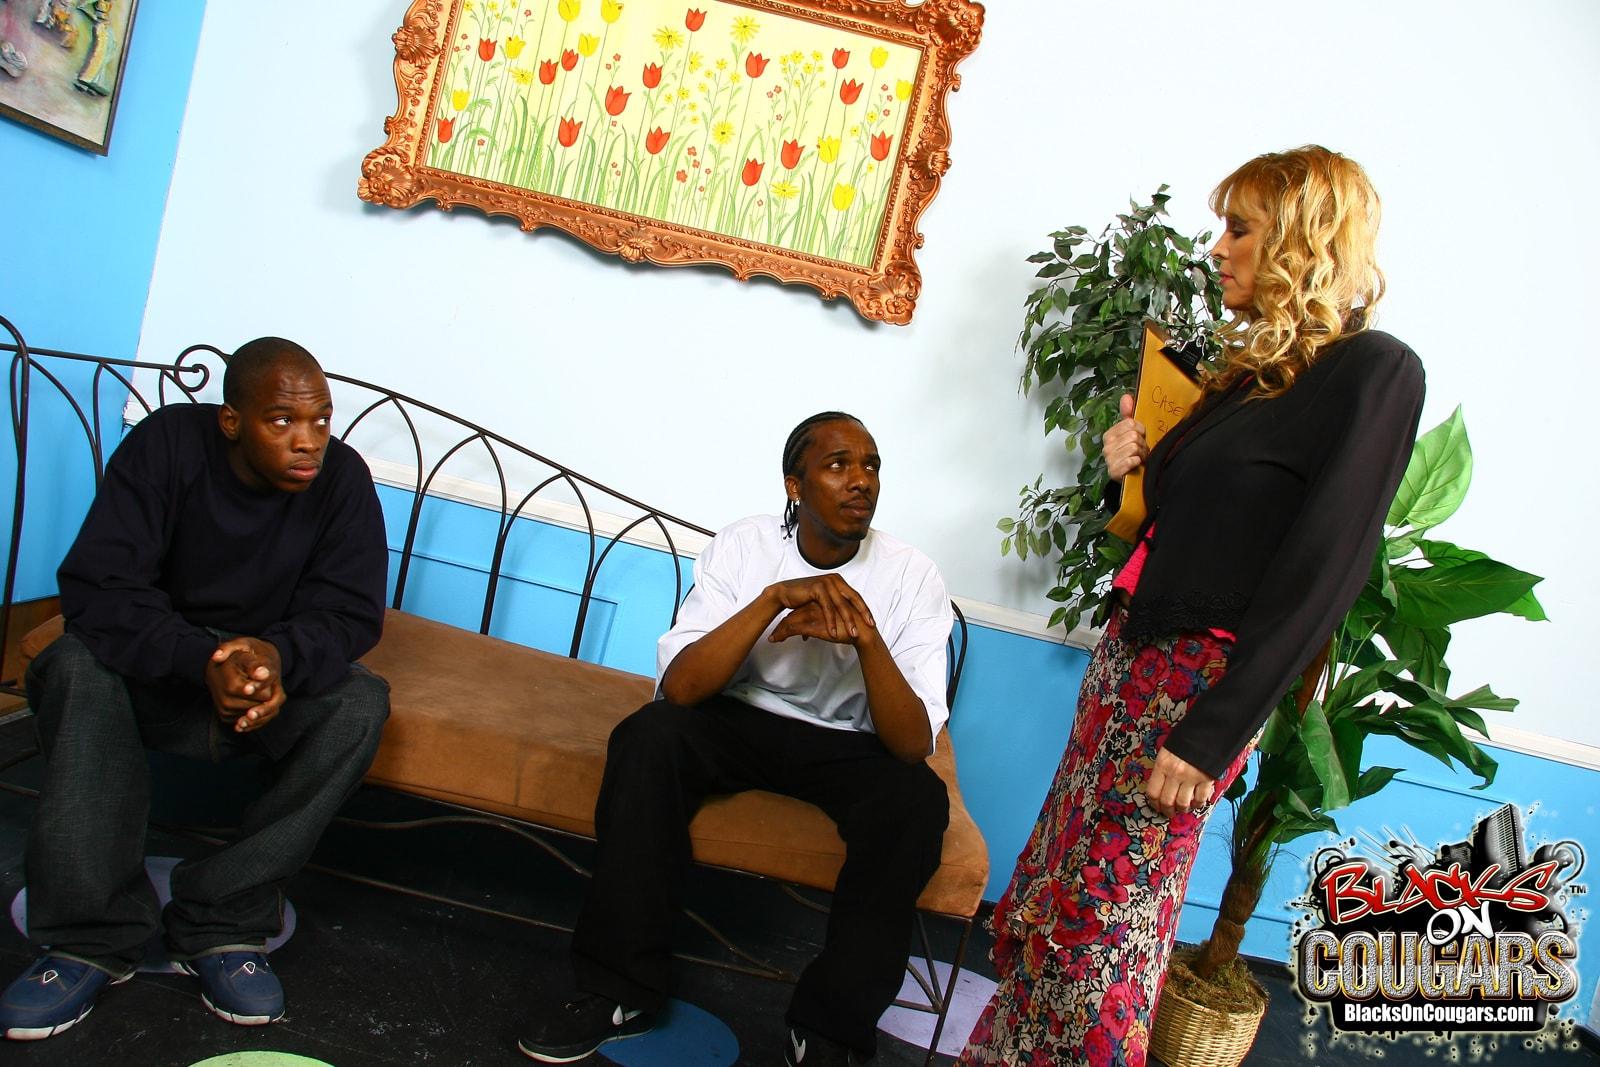 Dogfart '- Blacks On Cougars' starring Nicole Moore (Photo 2)